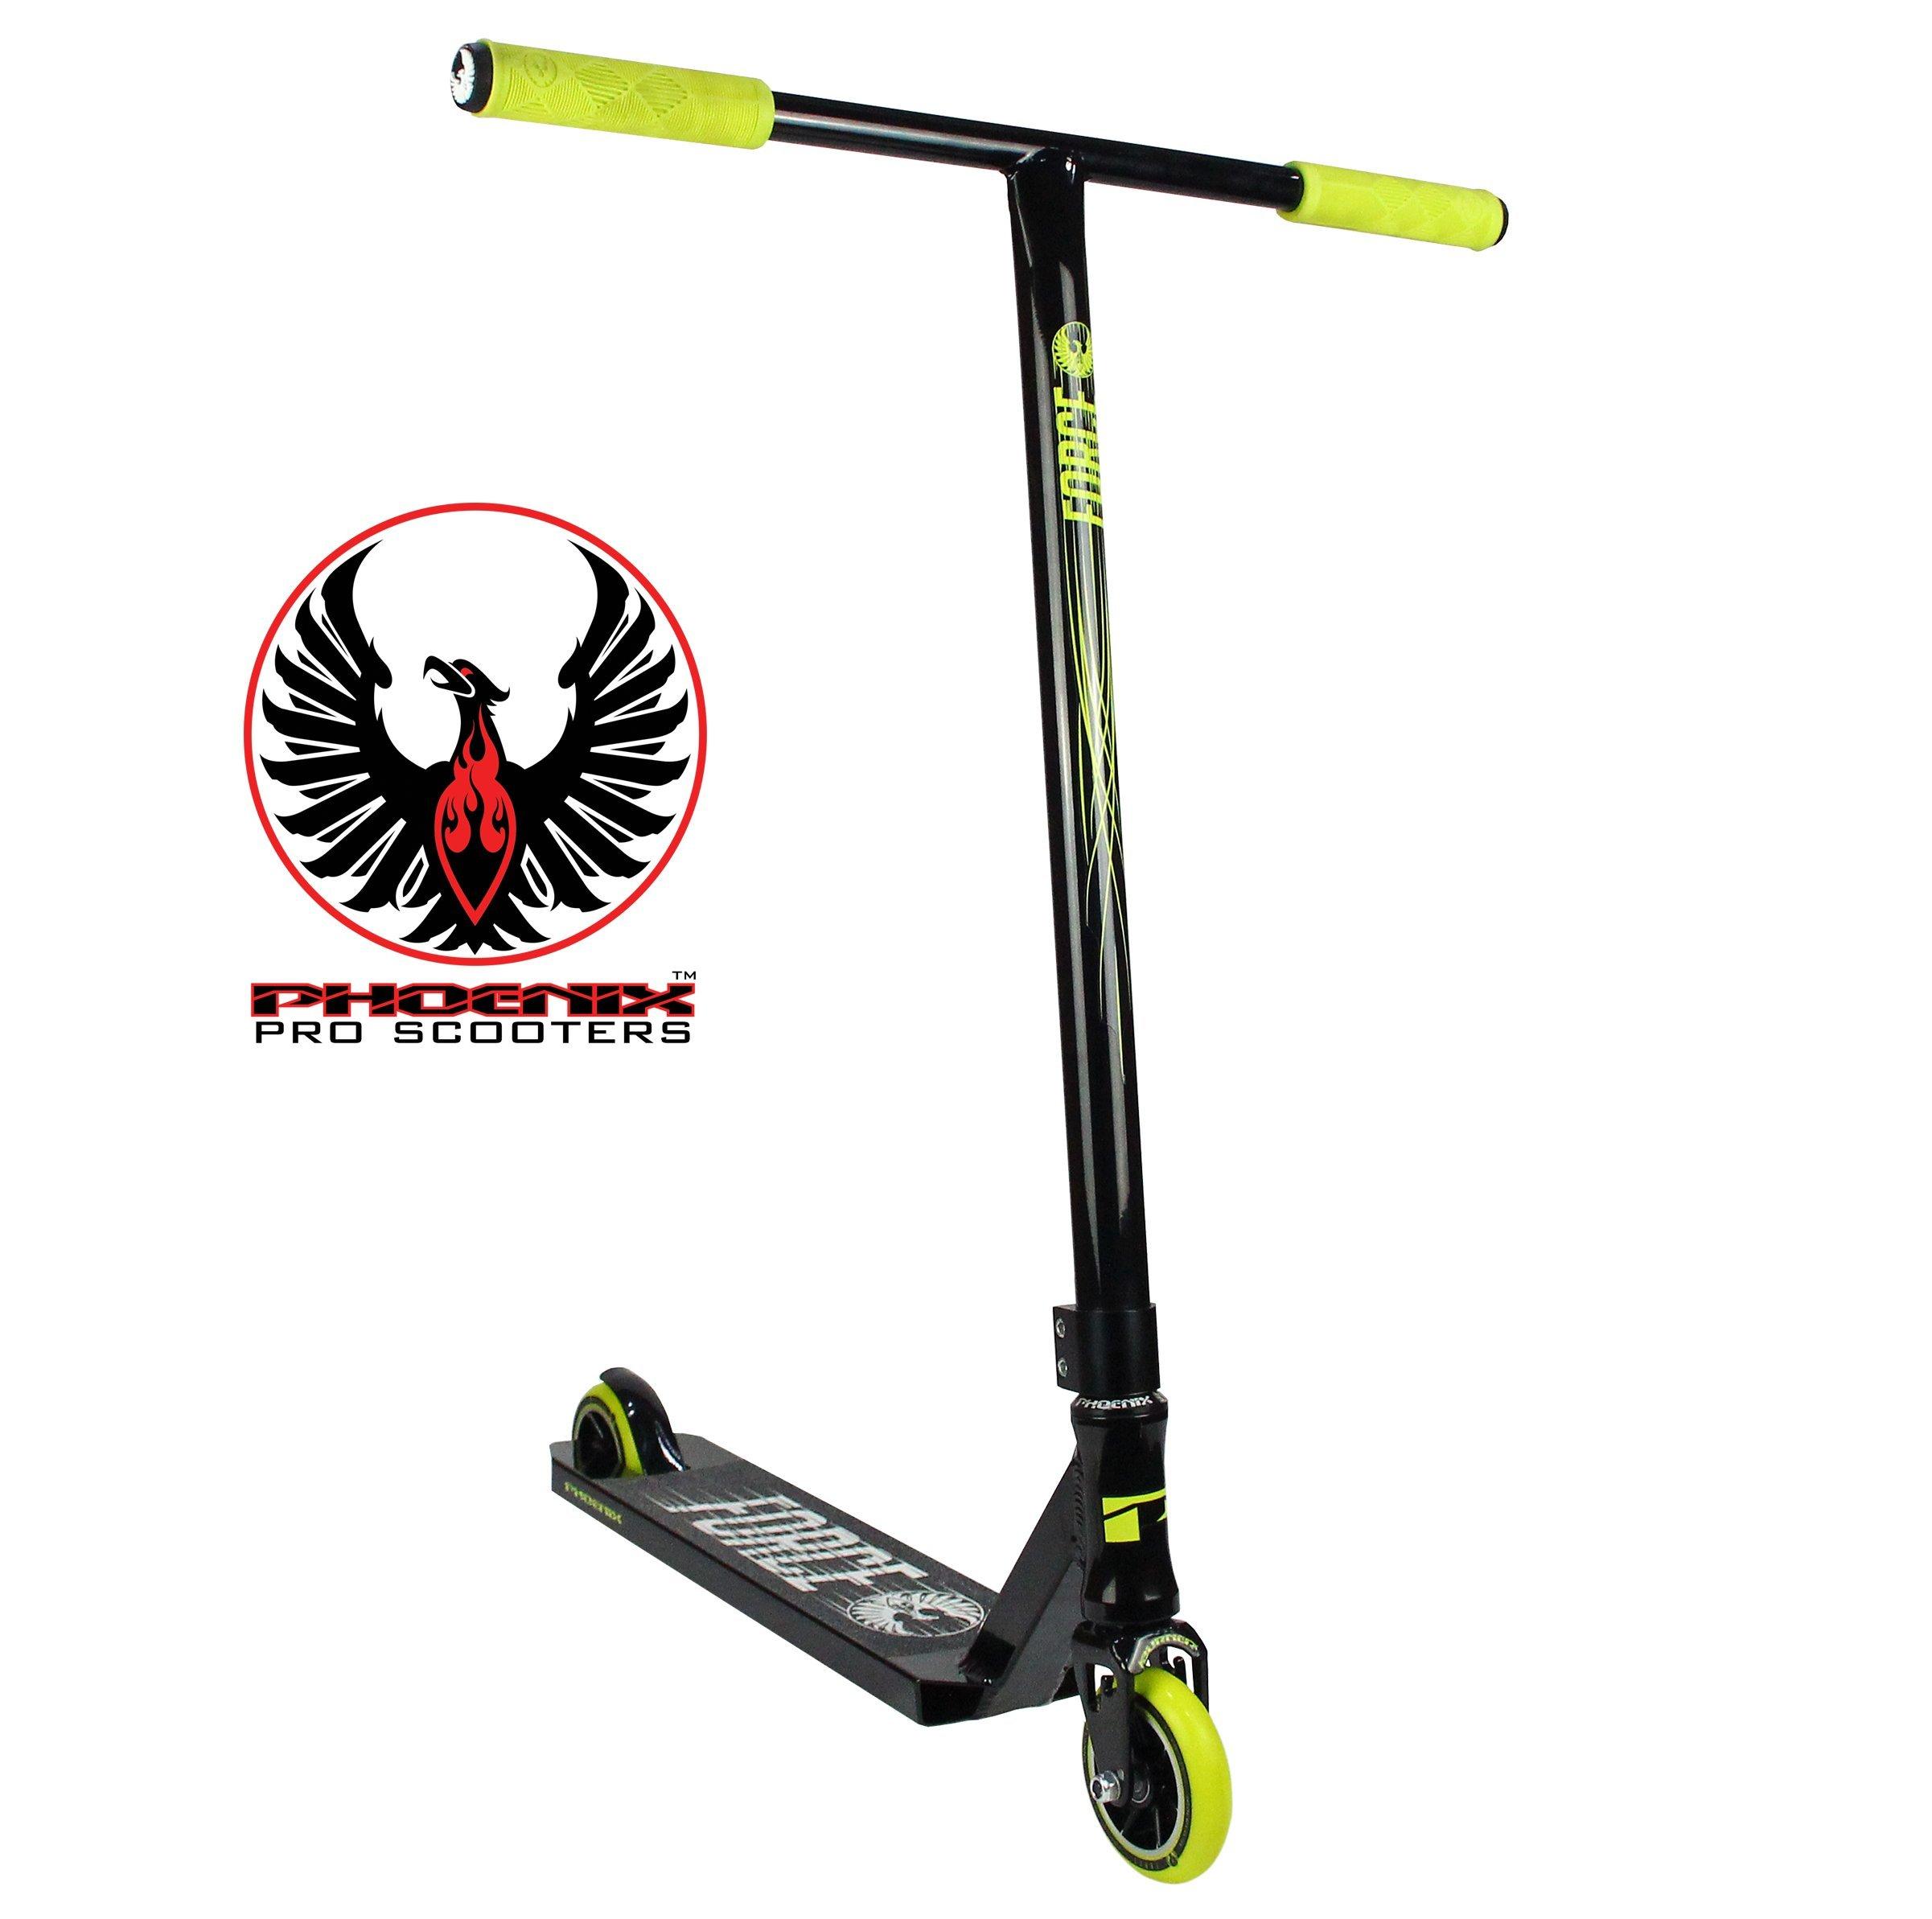 Phoenix Force Pro Scooter (Black/Neon Yellow) by Phoenix Pro Scooters